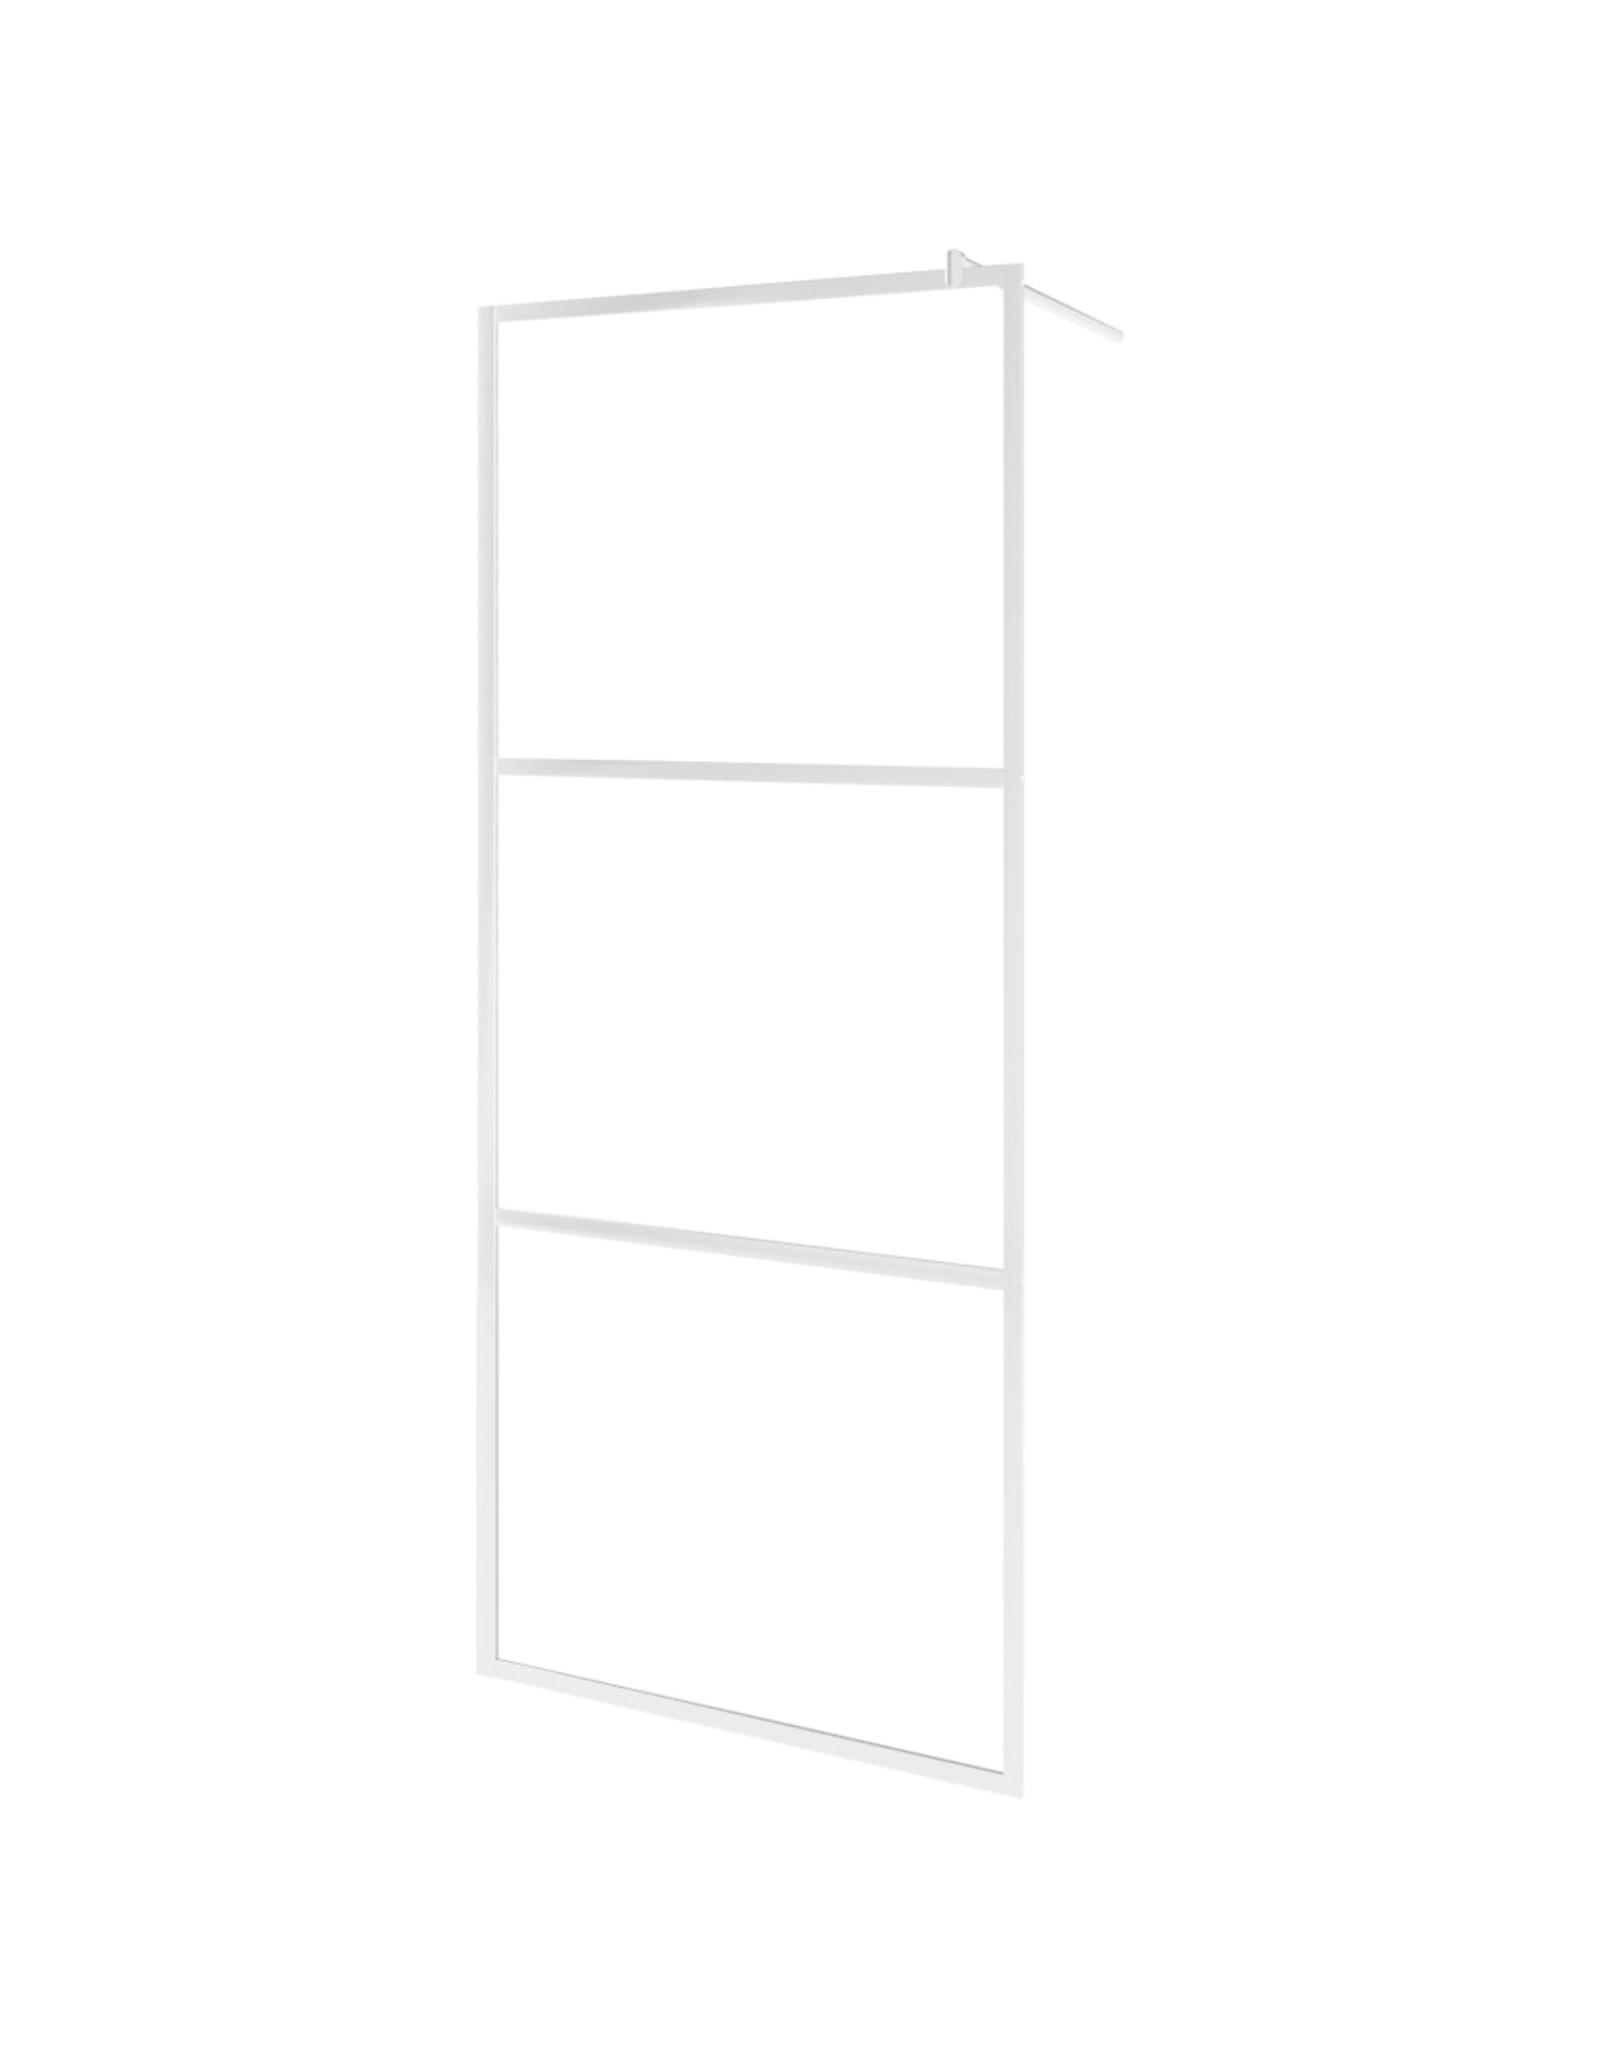 Inloopdouchewand halfmat 140x195 cm ESG-glas